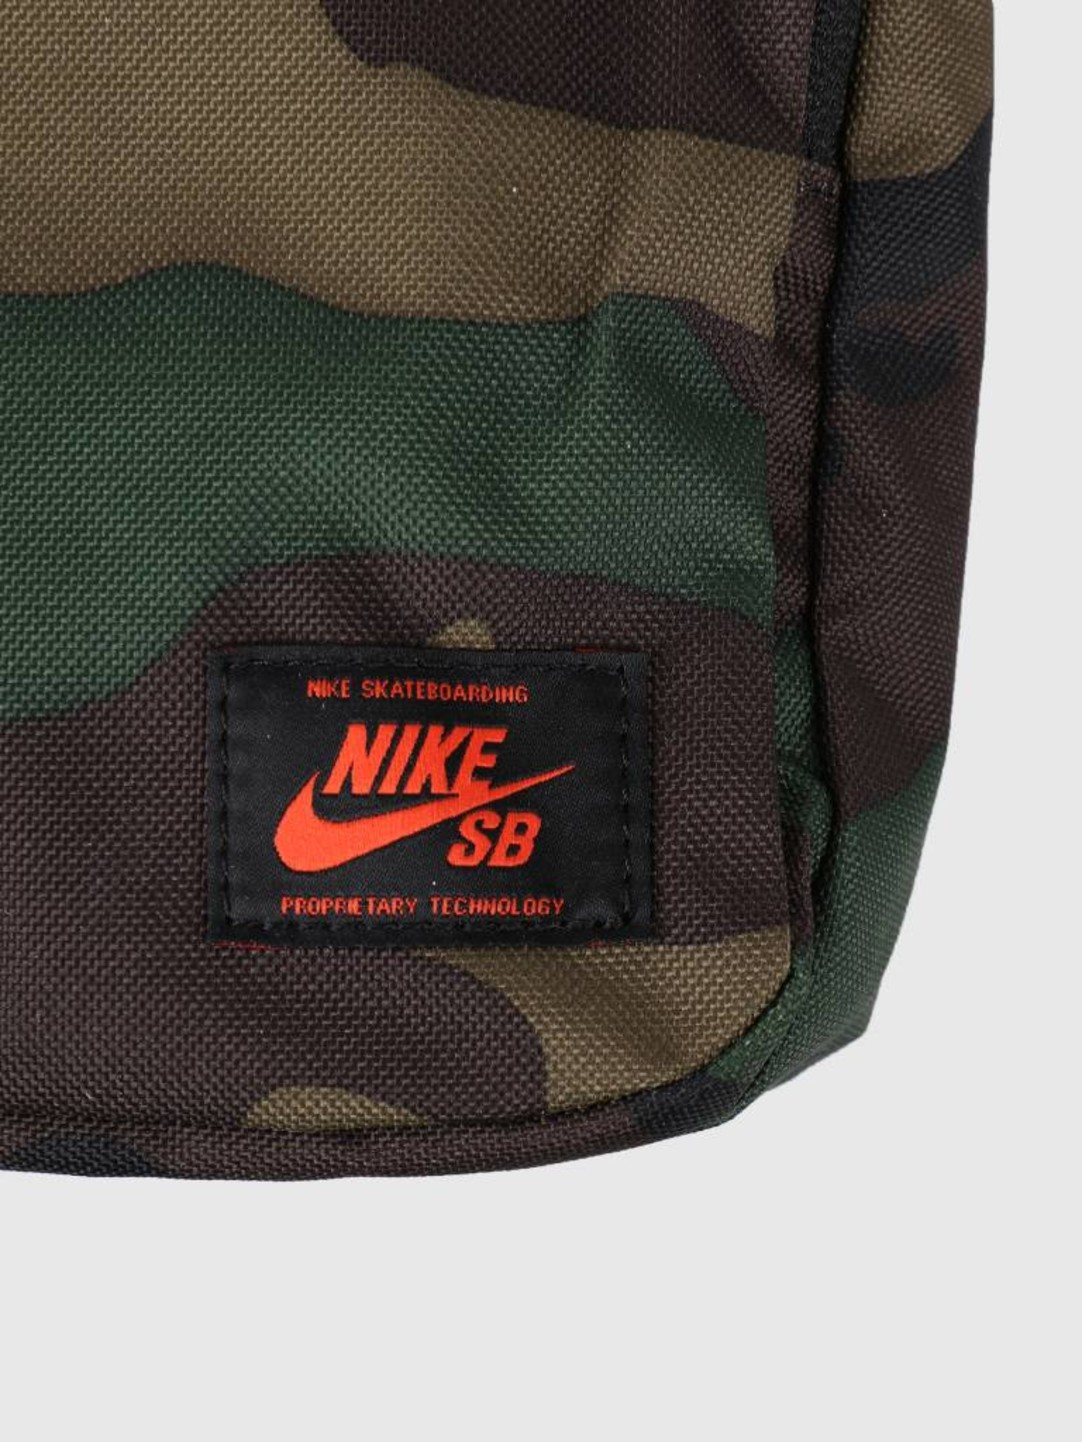 Nike Nike SB Heritage Bag Iguana Black Team Orange Ba5849-210